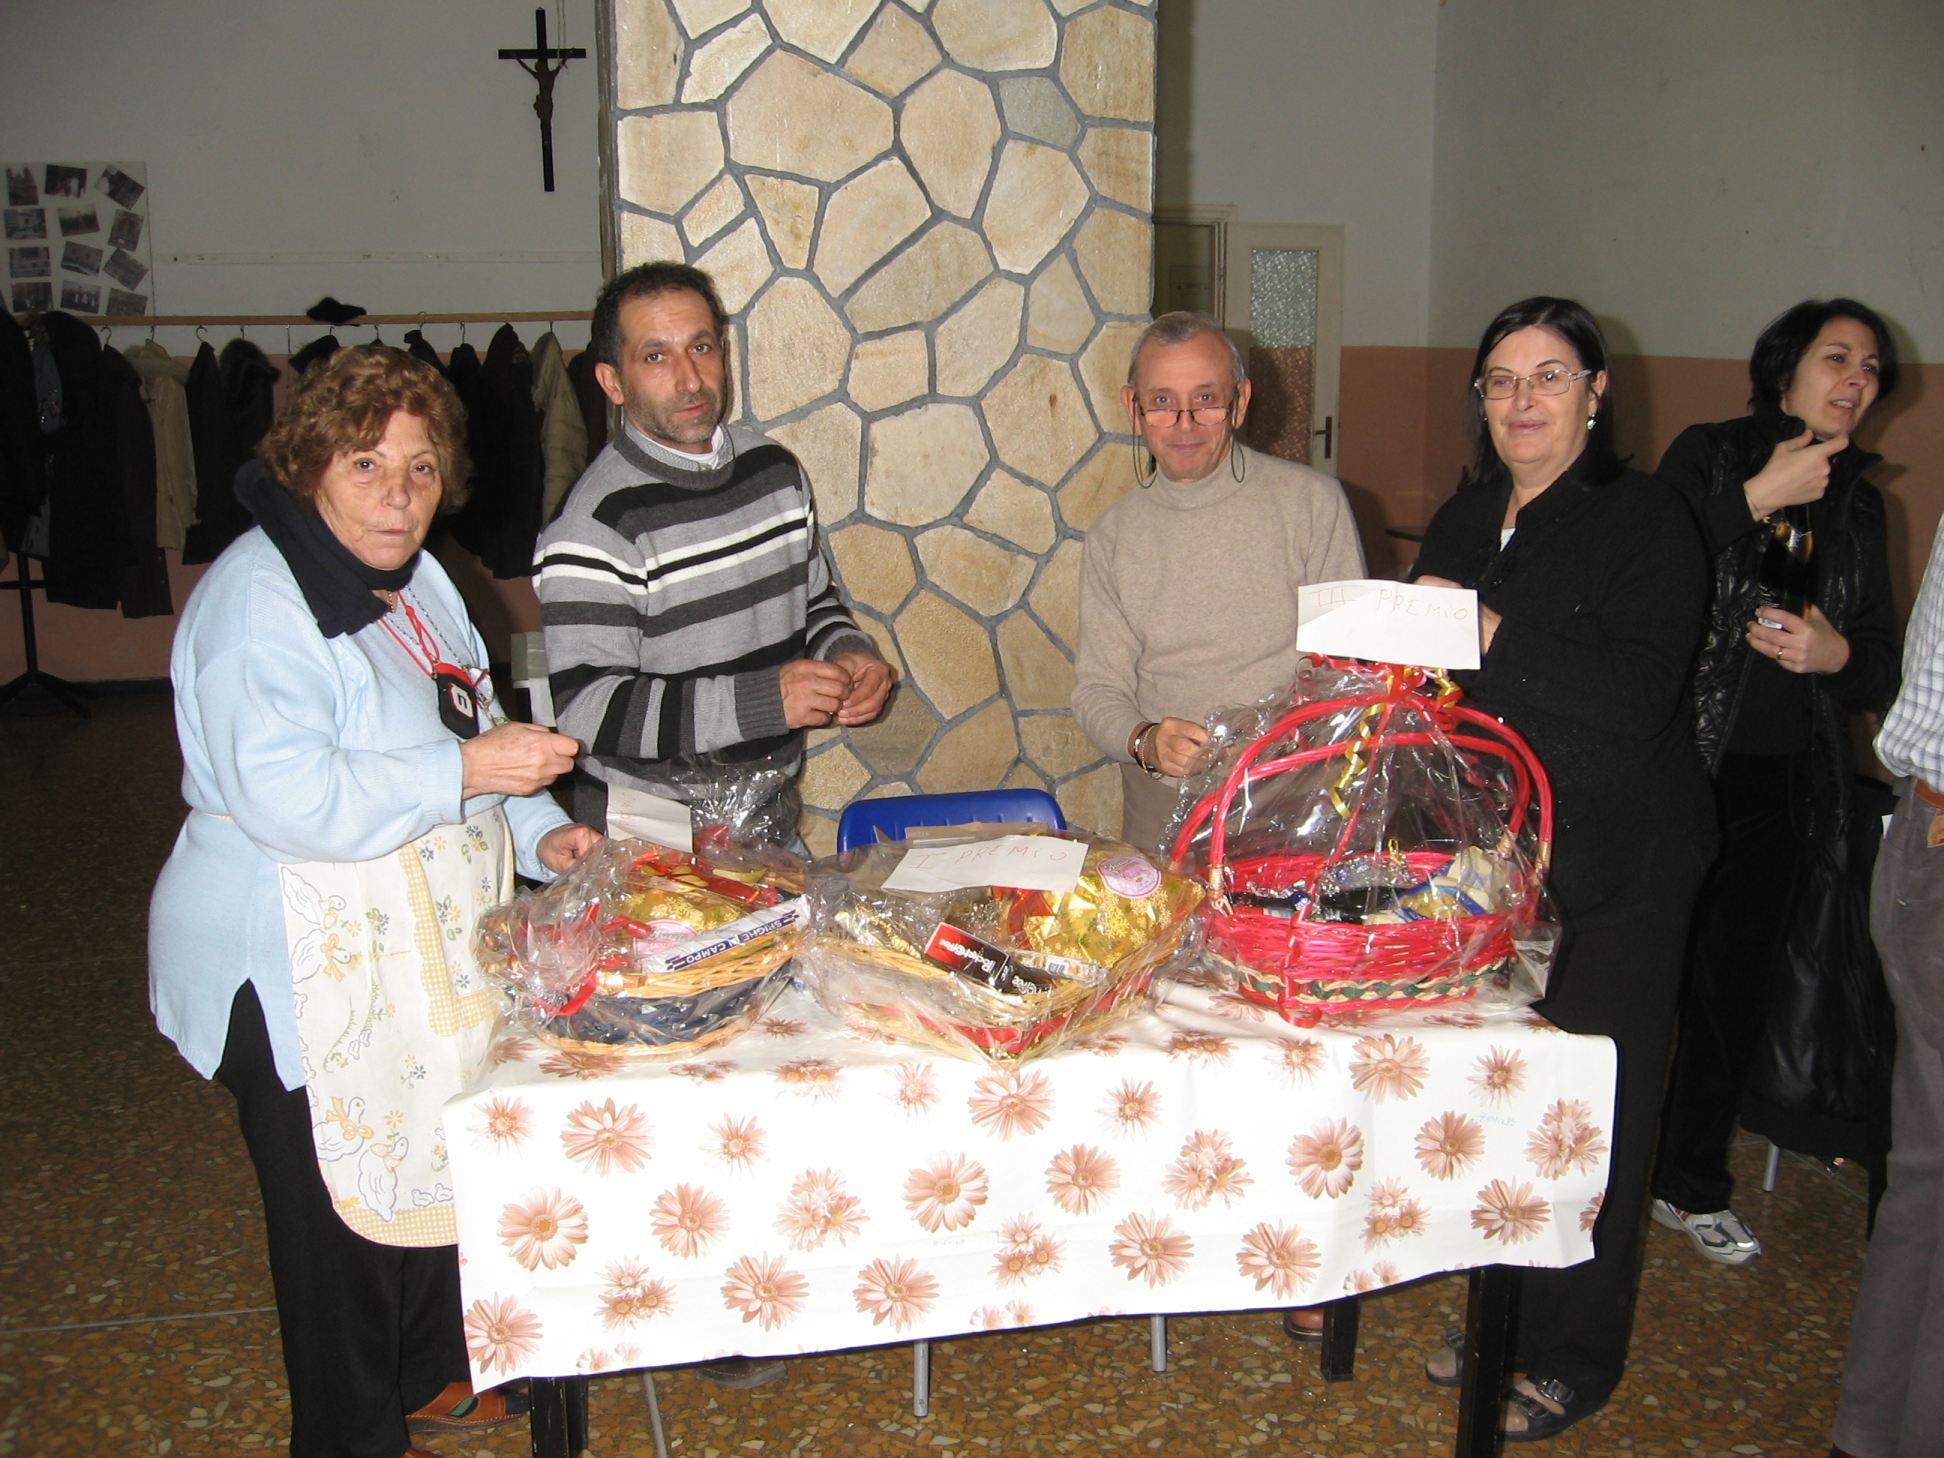 Pranzo_Comunitario-2009-12-19--14.40.15